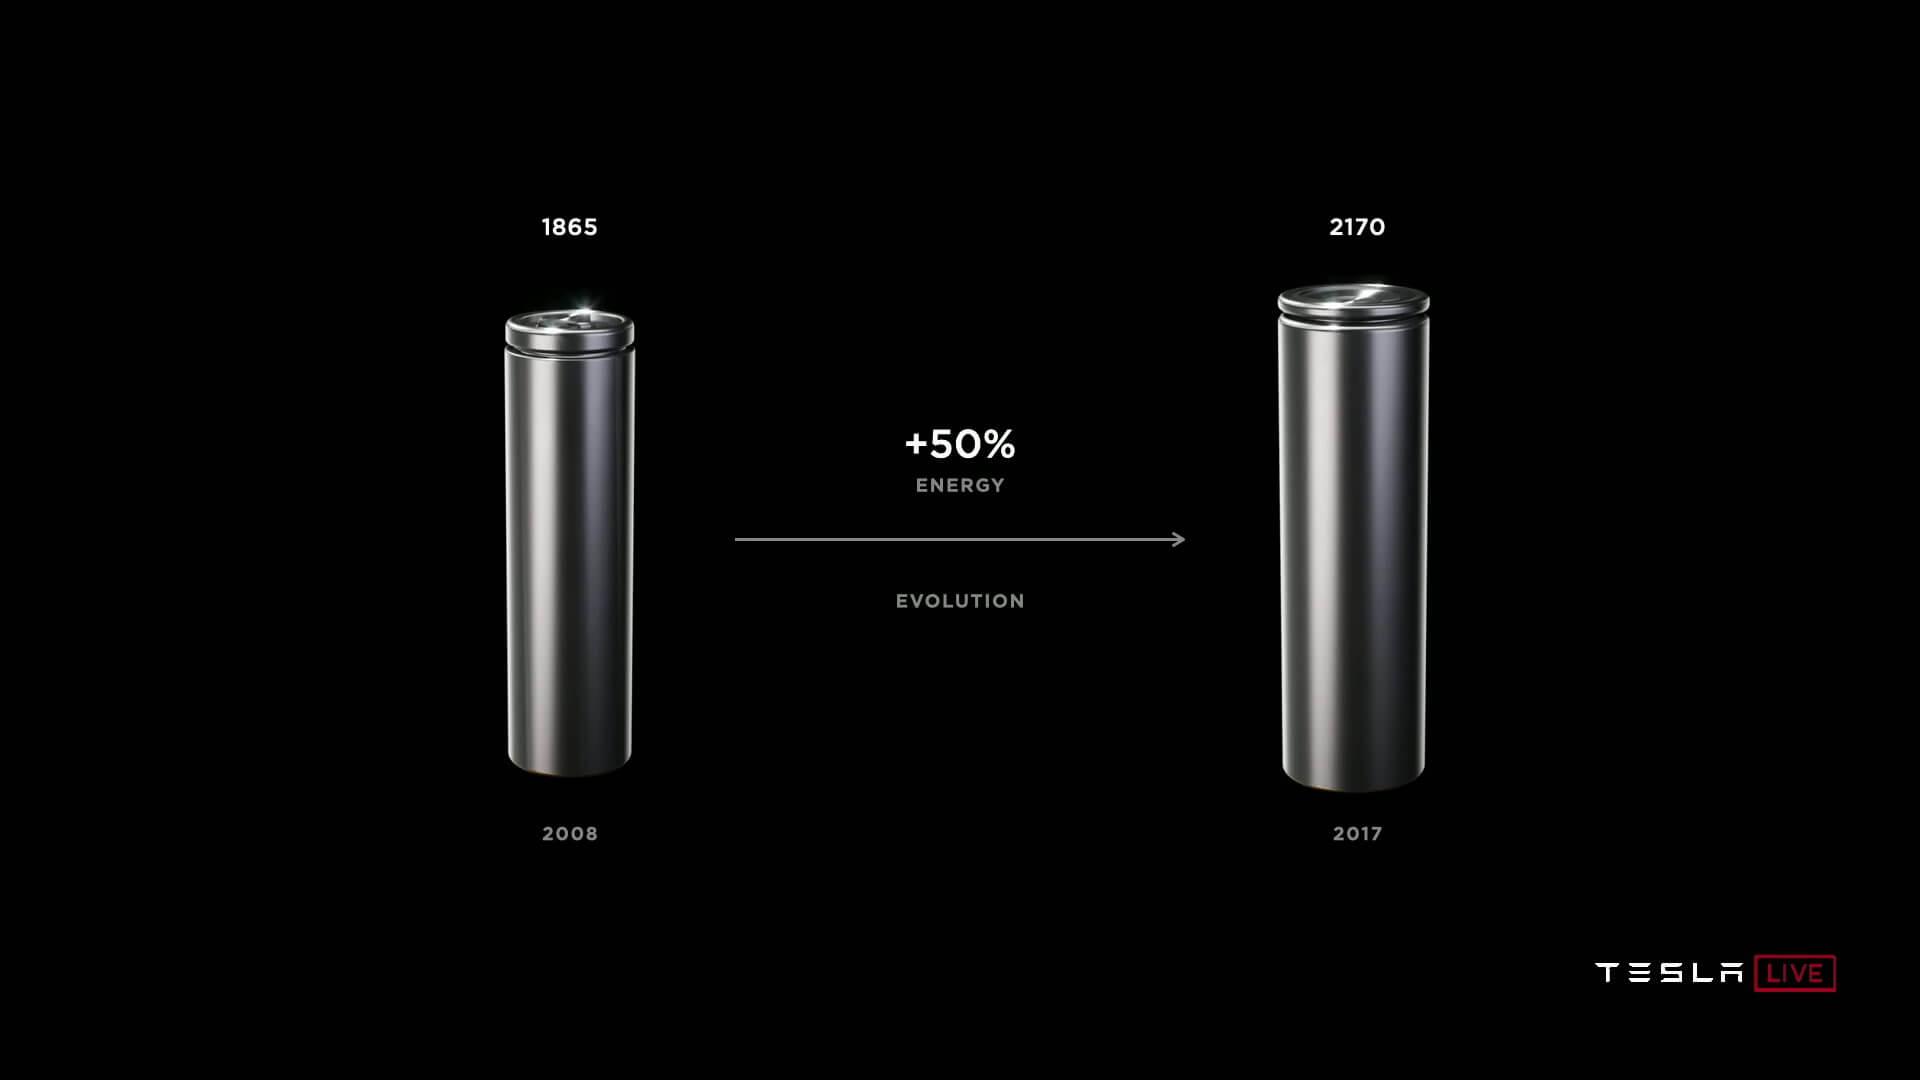 Tesla ранее перешла с форм-фактора ячеек 1865 на 2170